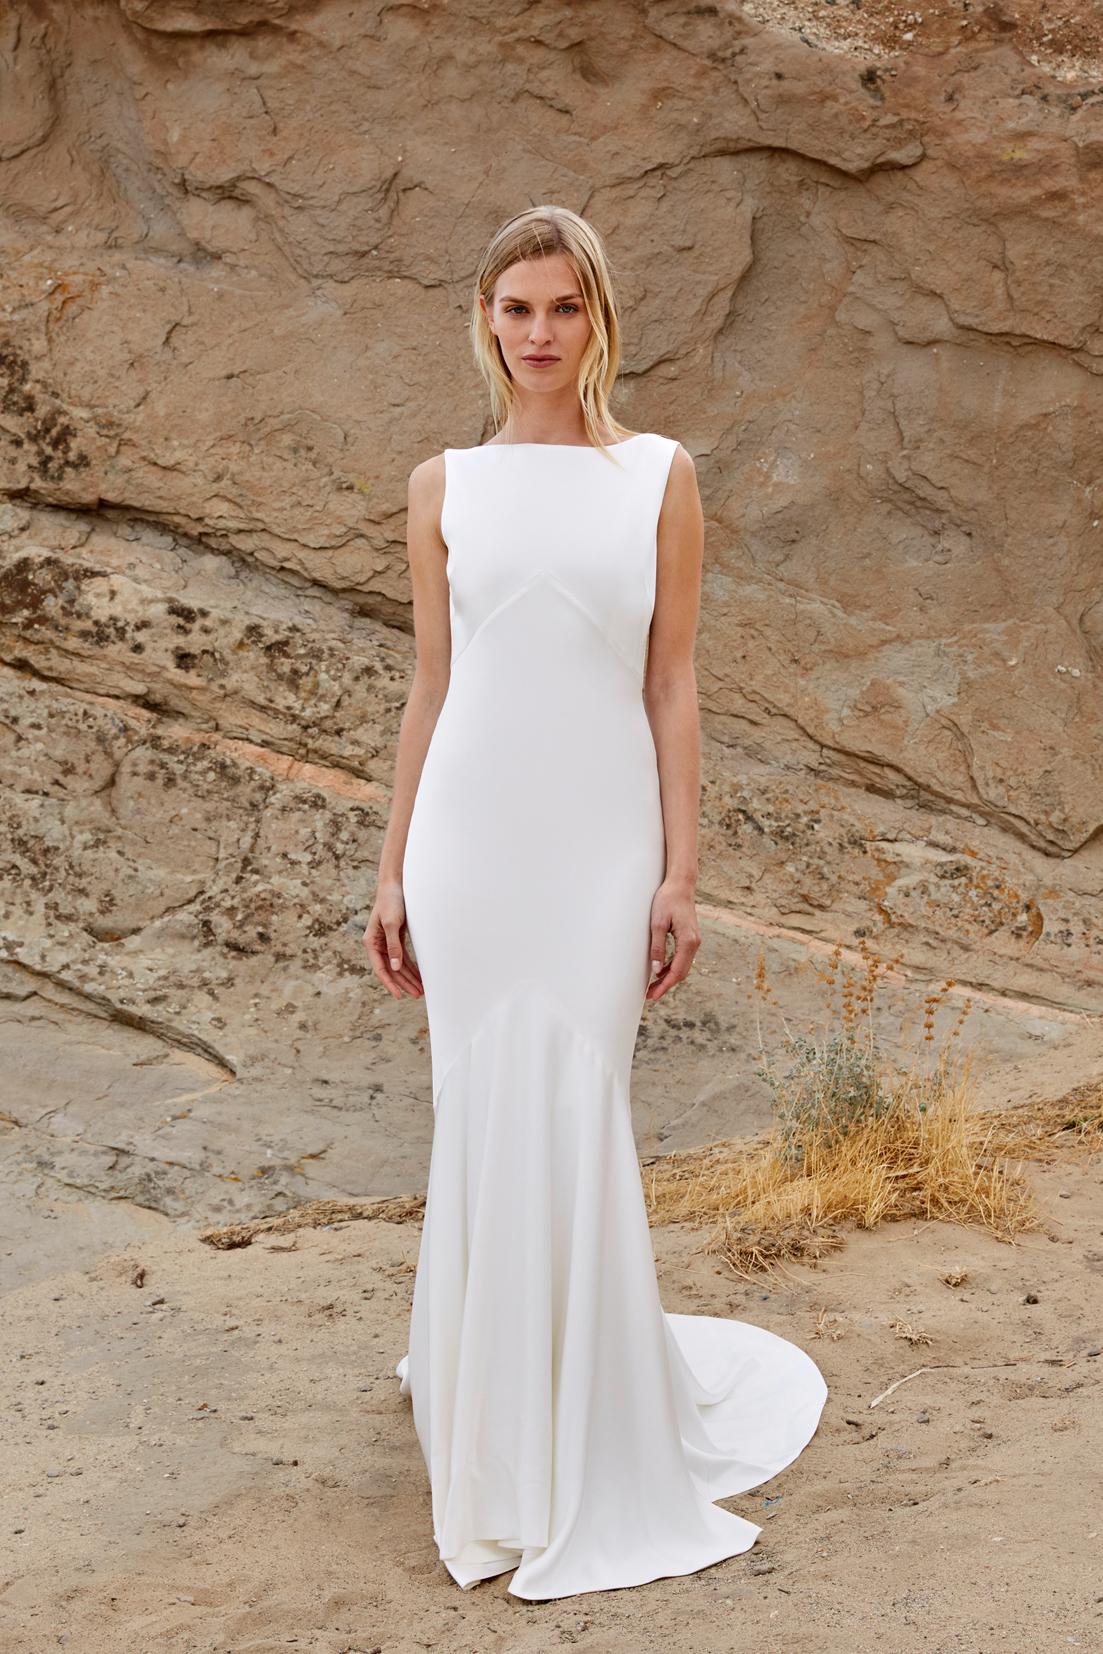 savannah miller fall 2018 boat neck column wedding dress